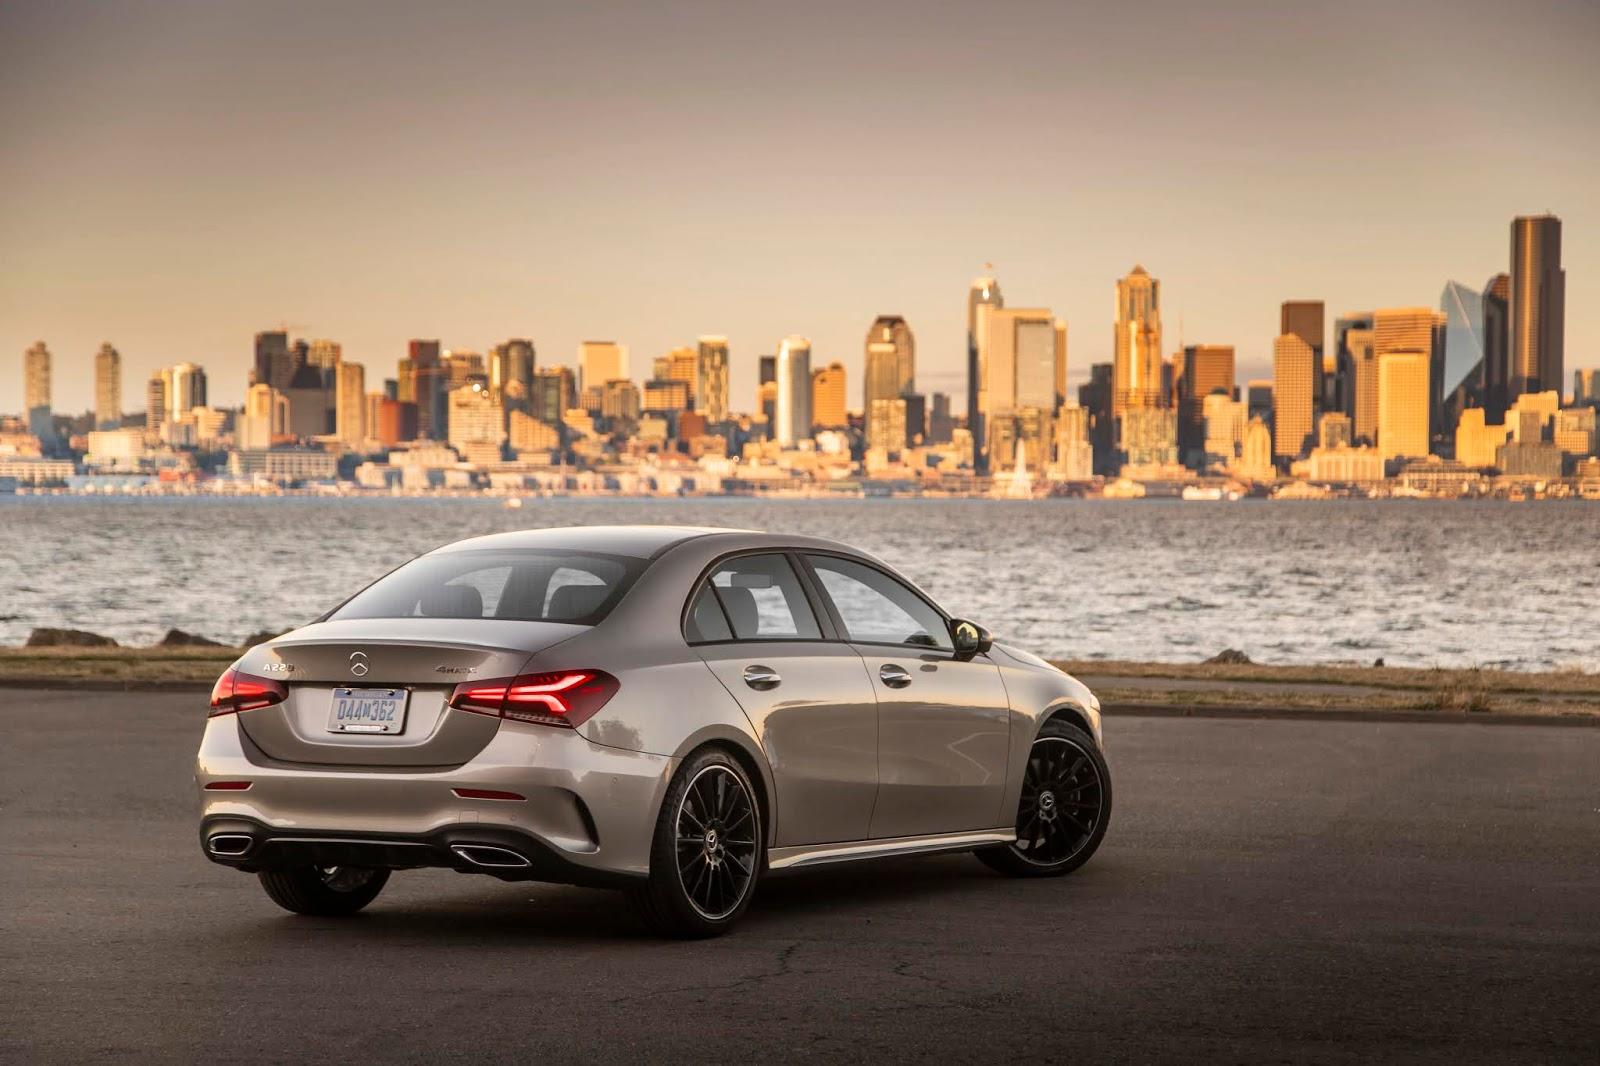 18C0777 008 Από 28.230 ευρώ η τιμή της Mercedes A-Class Sedan Luxury sedan, Mercedes, Mercedes AMG, premium sedan, sedan, zblog, καινούργιο, καινούρια, τιμες